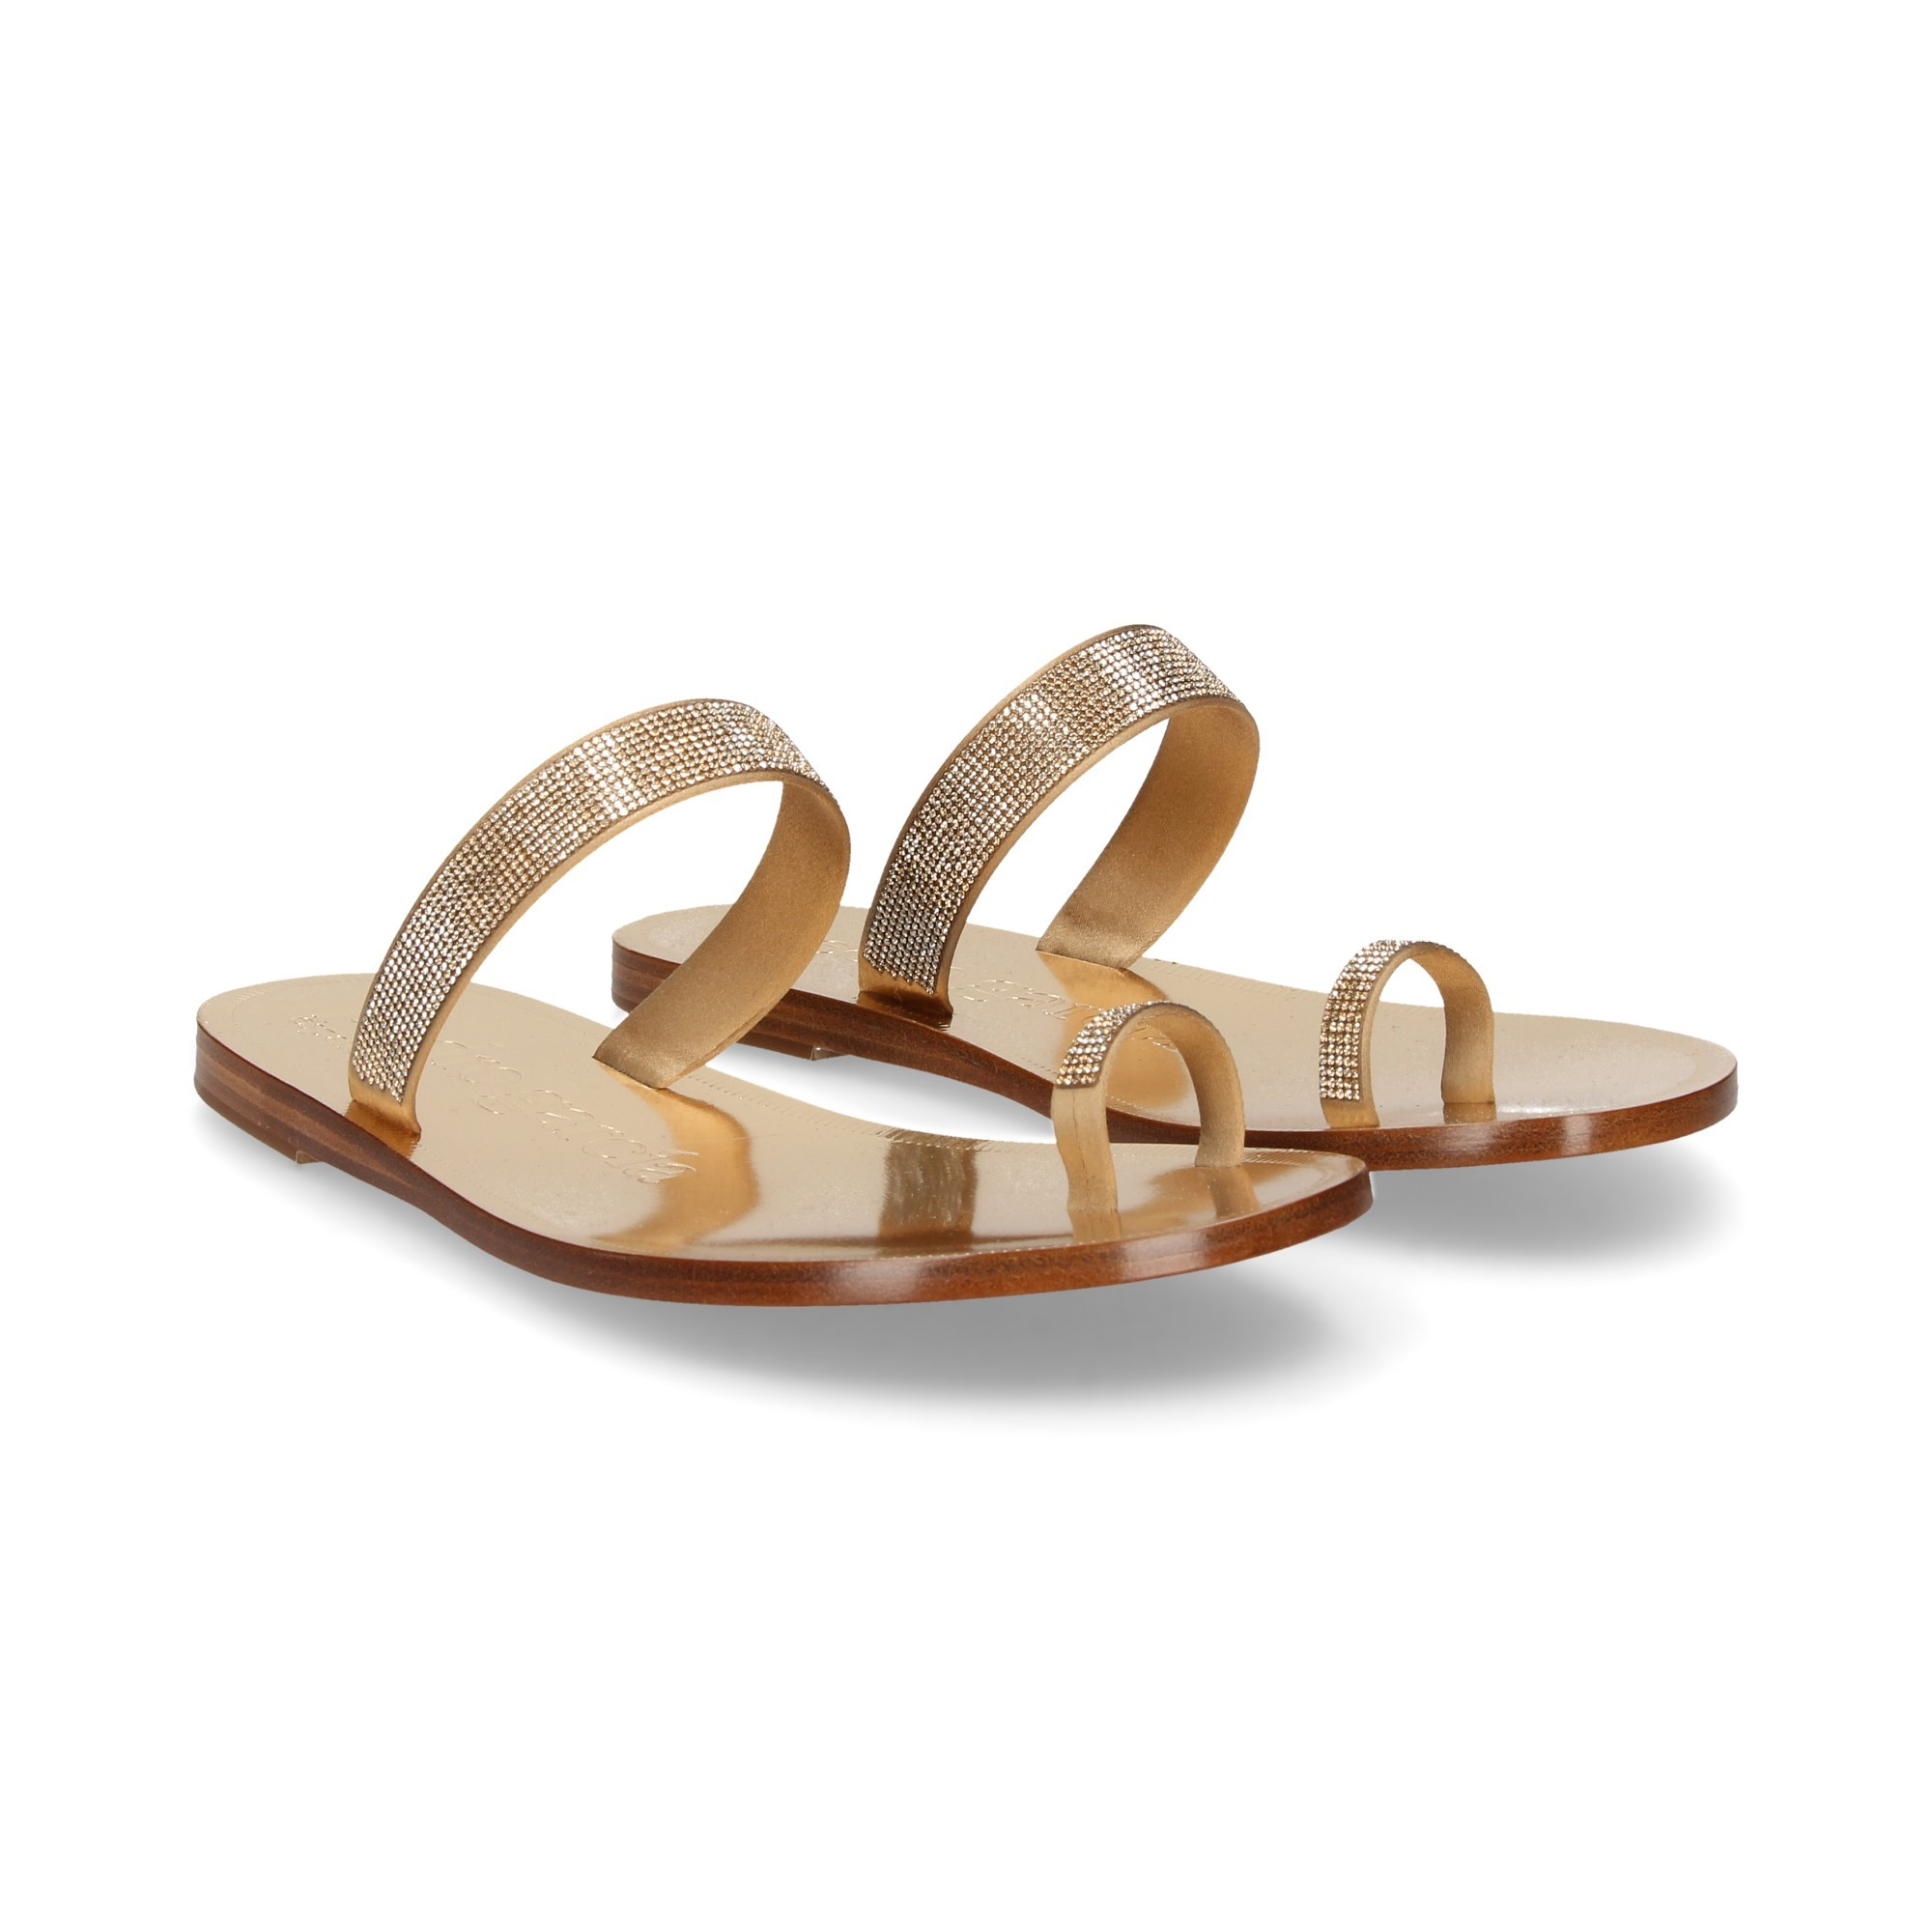 2b1b7a2265af PEDRO GARCIA Women s Flat sandals ZARINA ORO